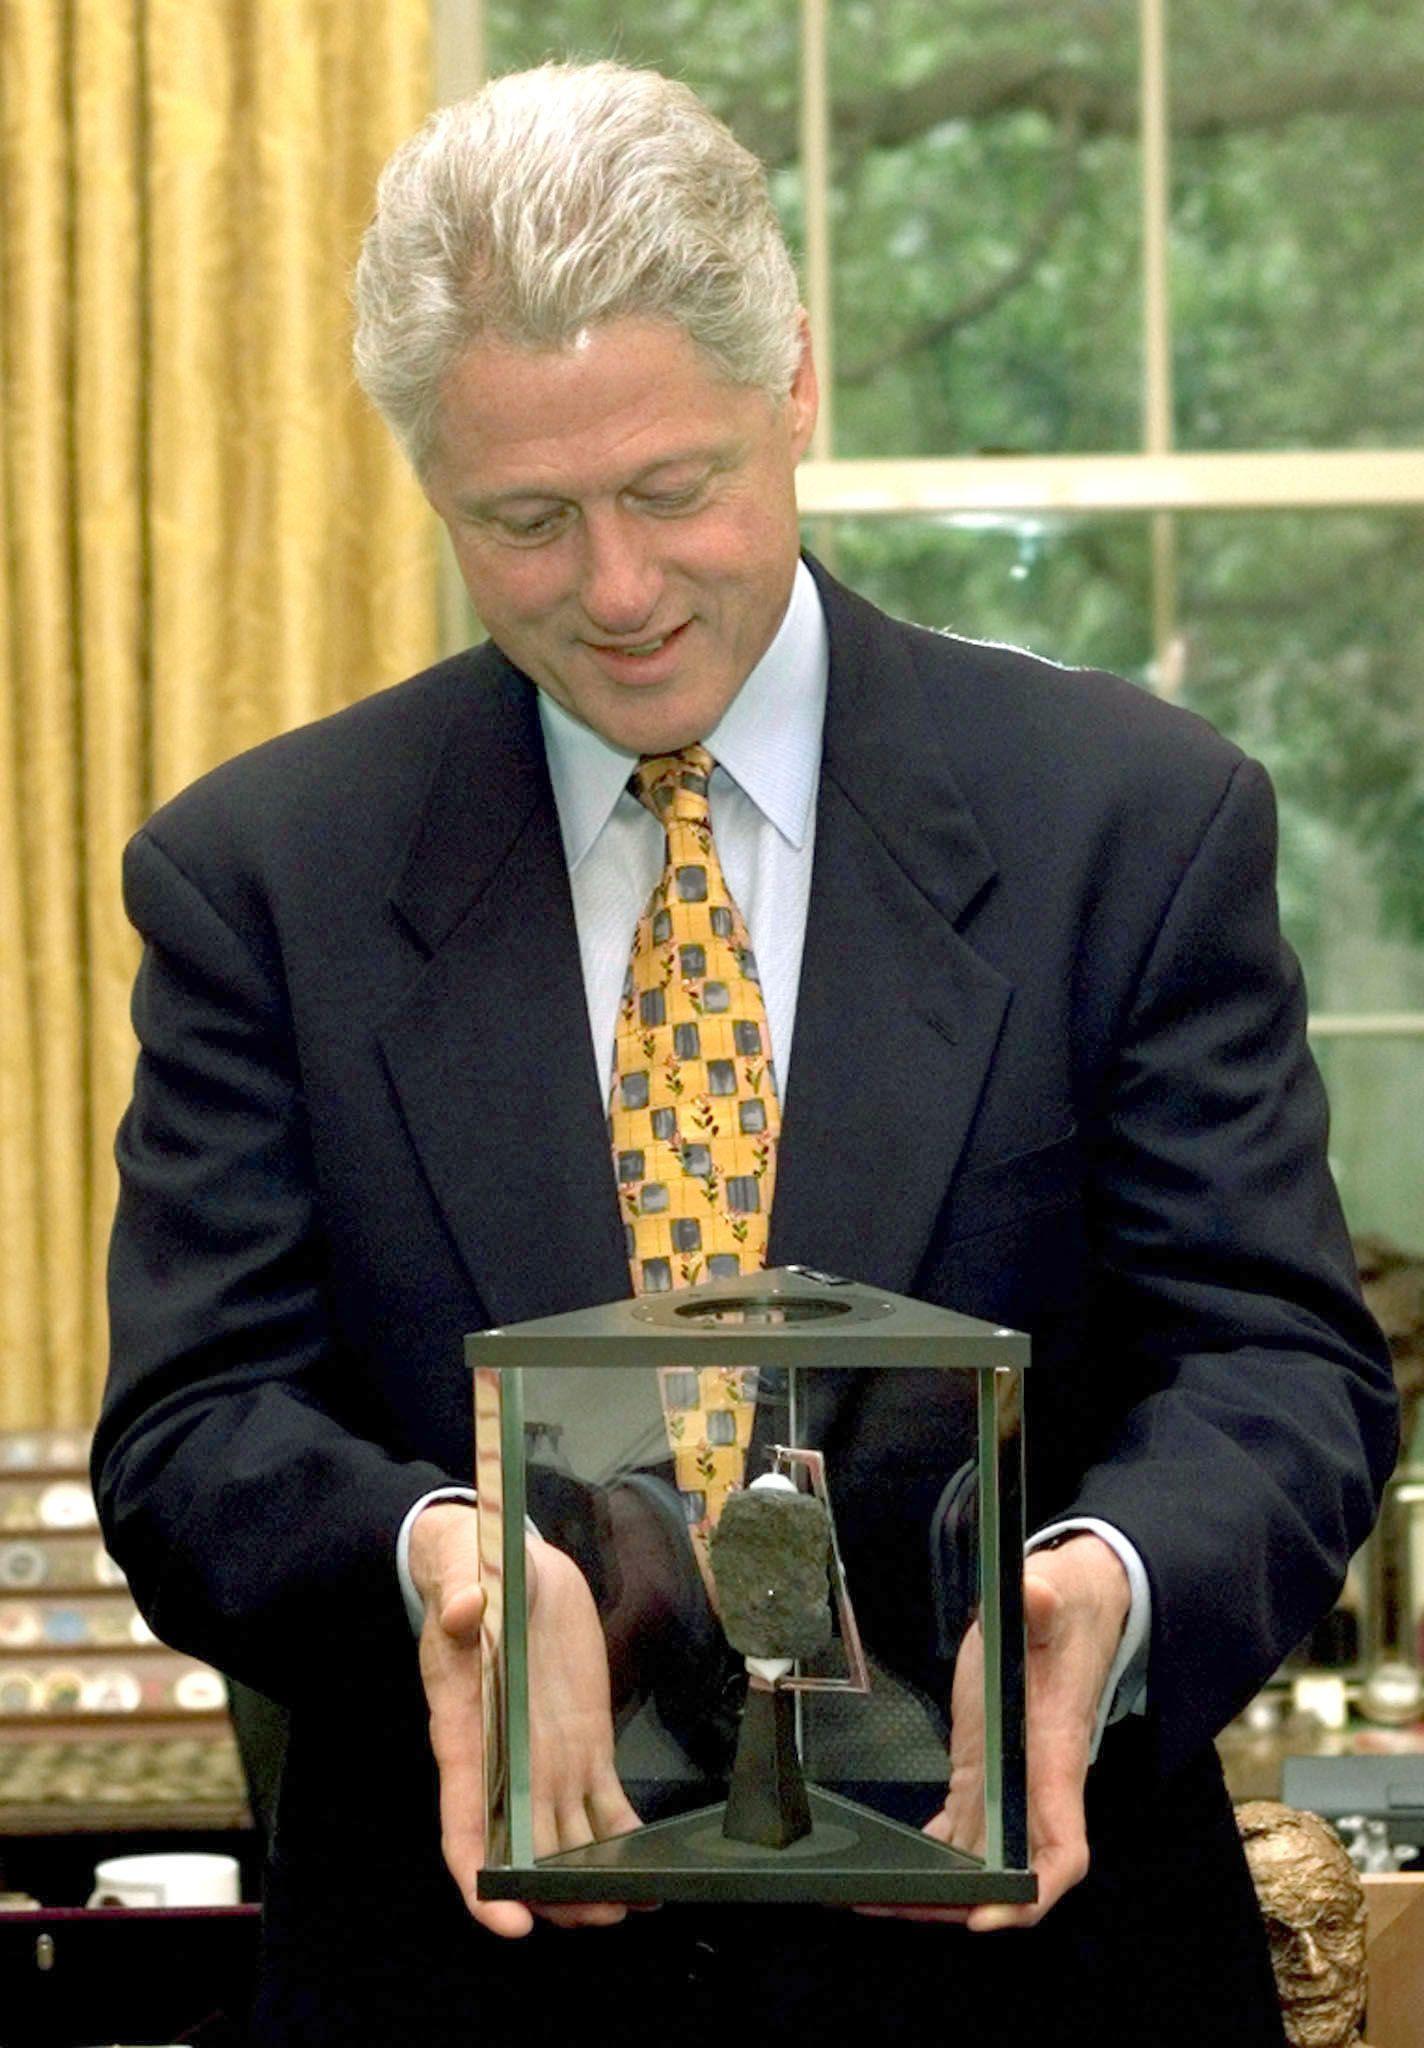 Verlorenes Mondgestein/ Bill Clinton